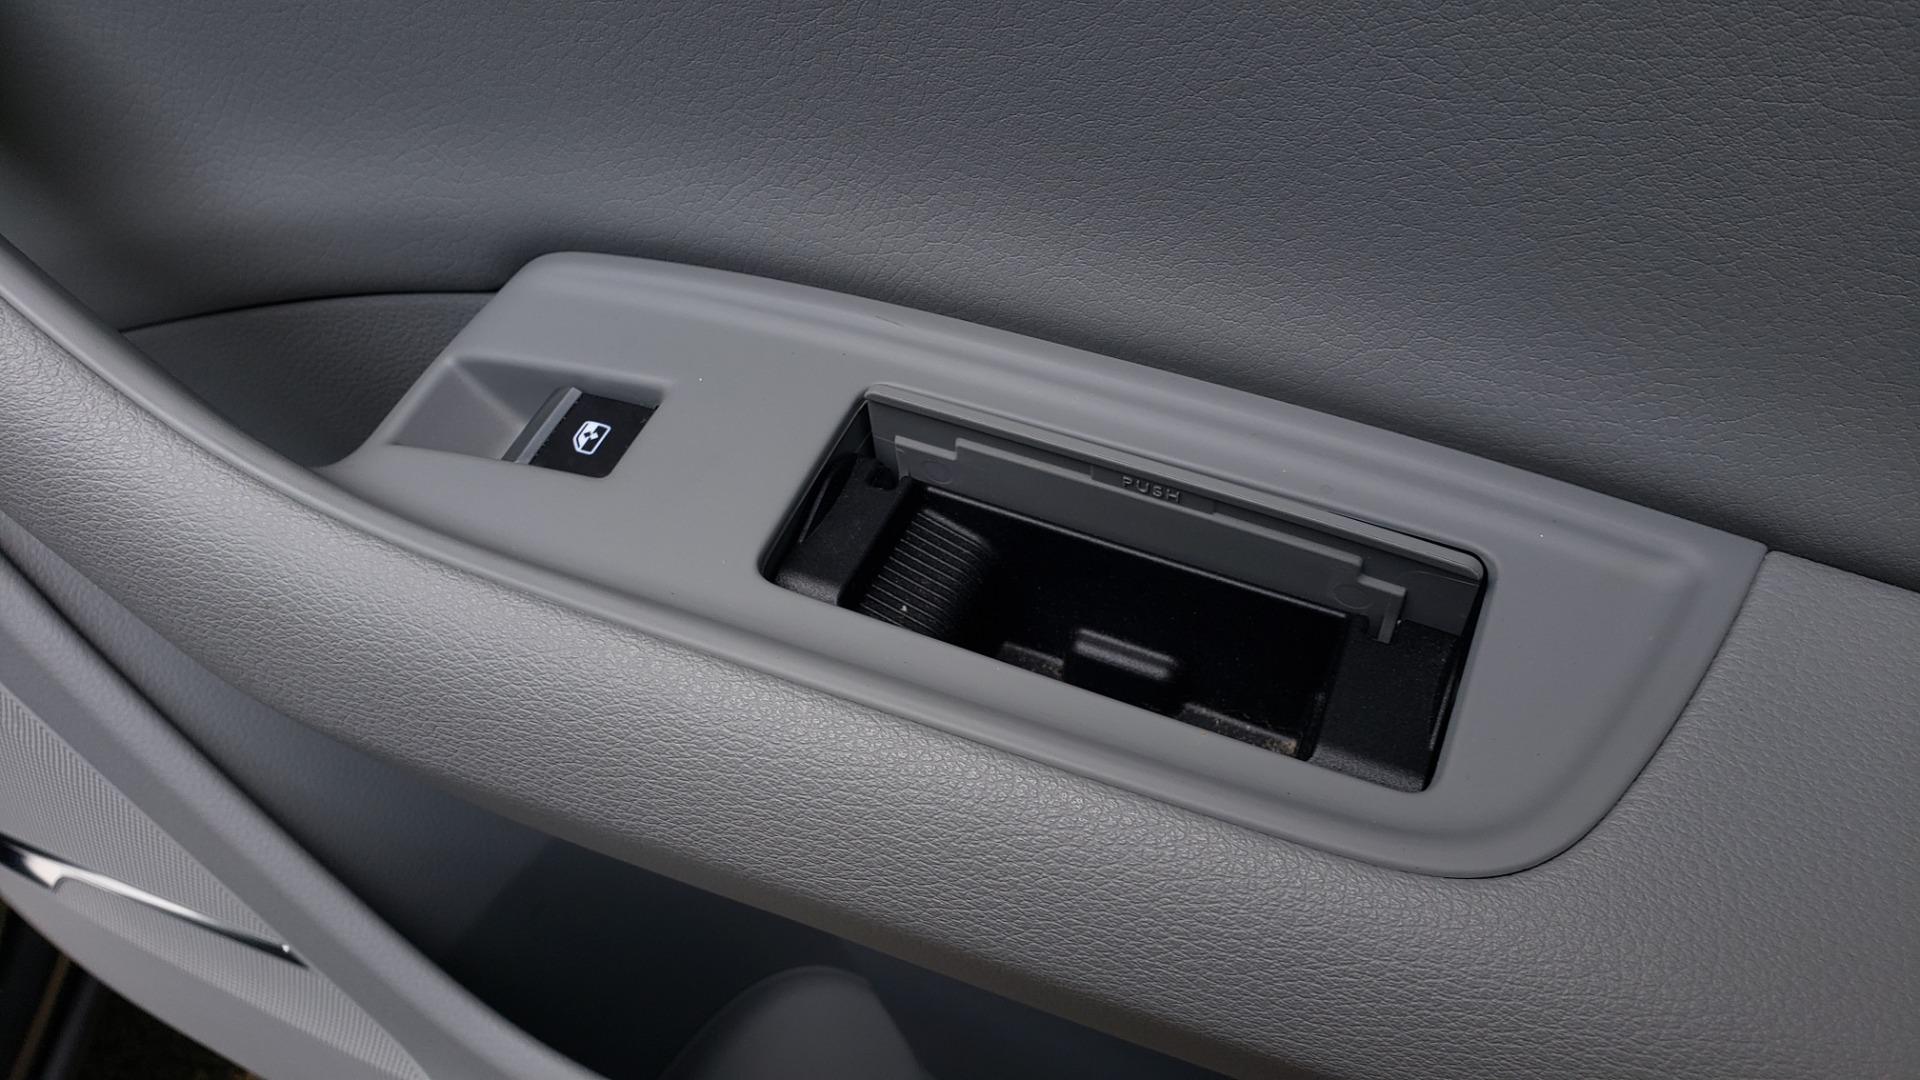 Used 2018 Audi Q7 PRESTIGE TIPTRONIC / NAV / SUNROOF / ADAPTIVE PKG / DRVR ASST / CLD WTHR /  for sale $49,995 at Formula Imports in Charlotte NC 28227 76